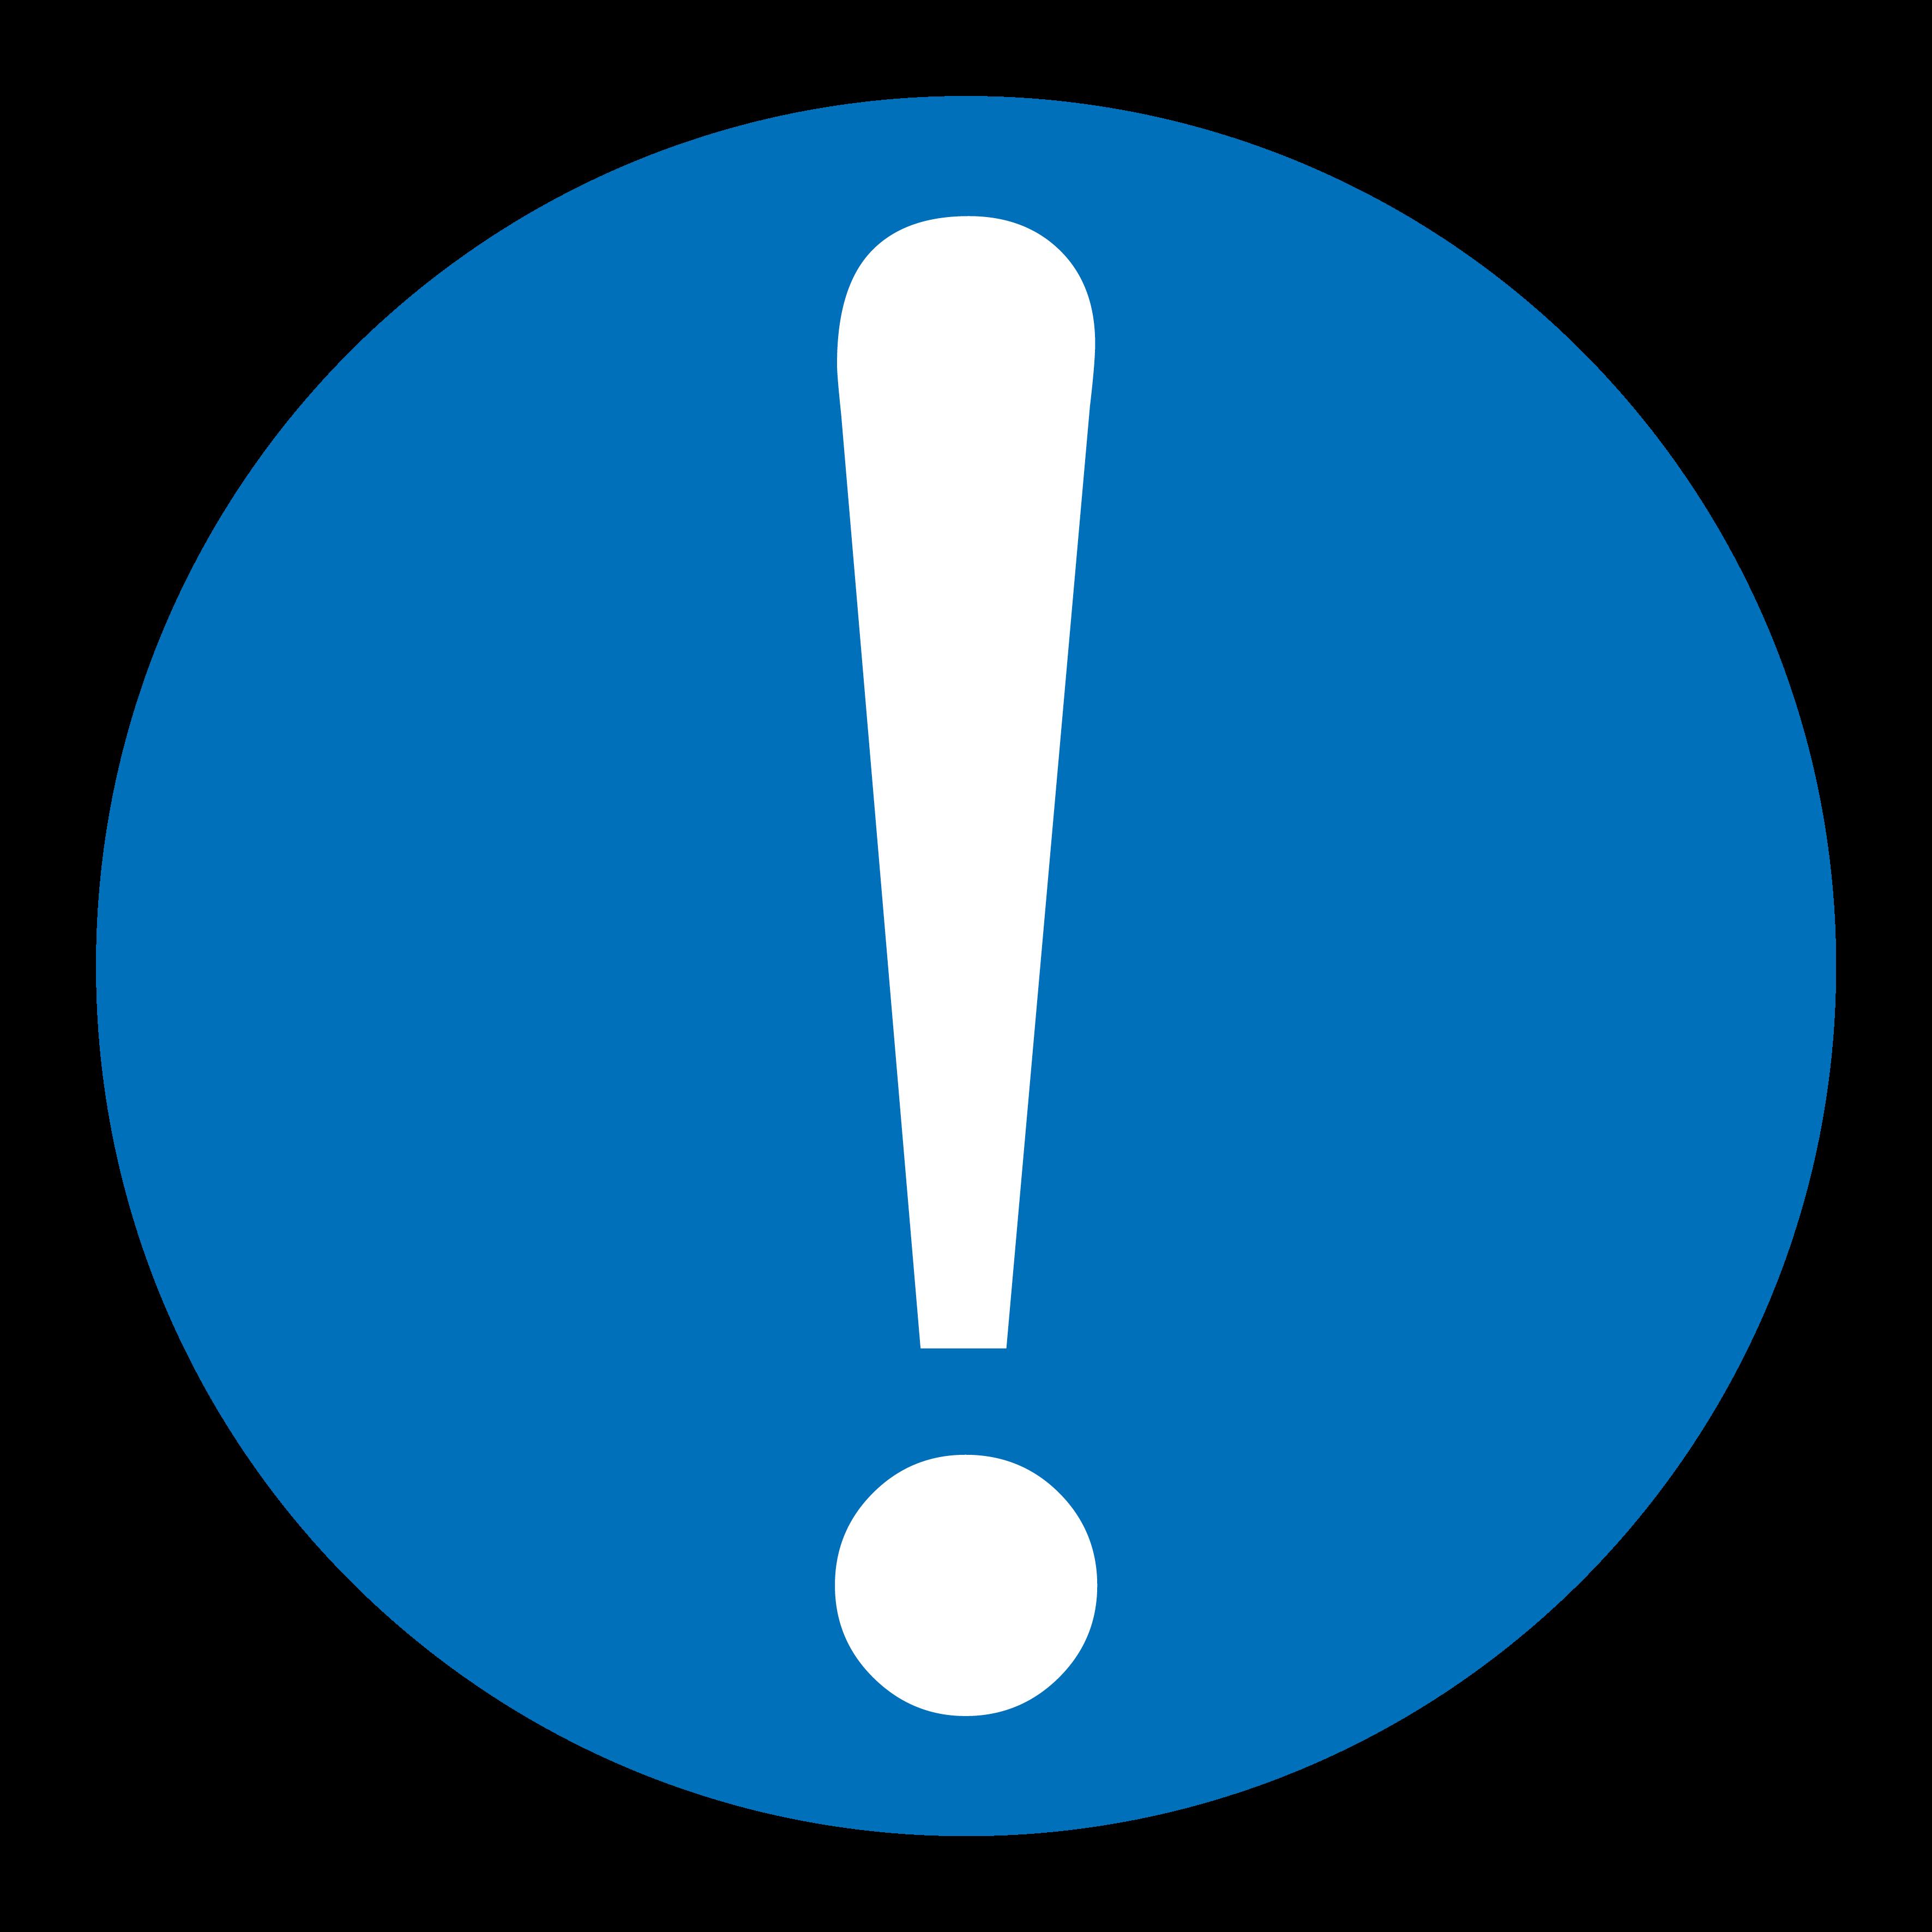 Prüfungsordnung icon